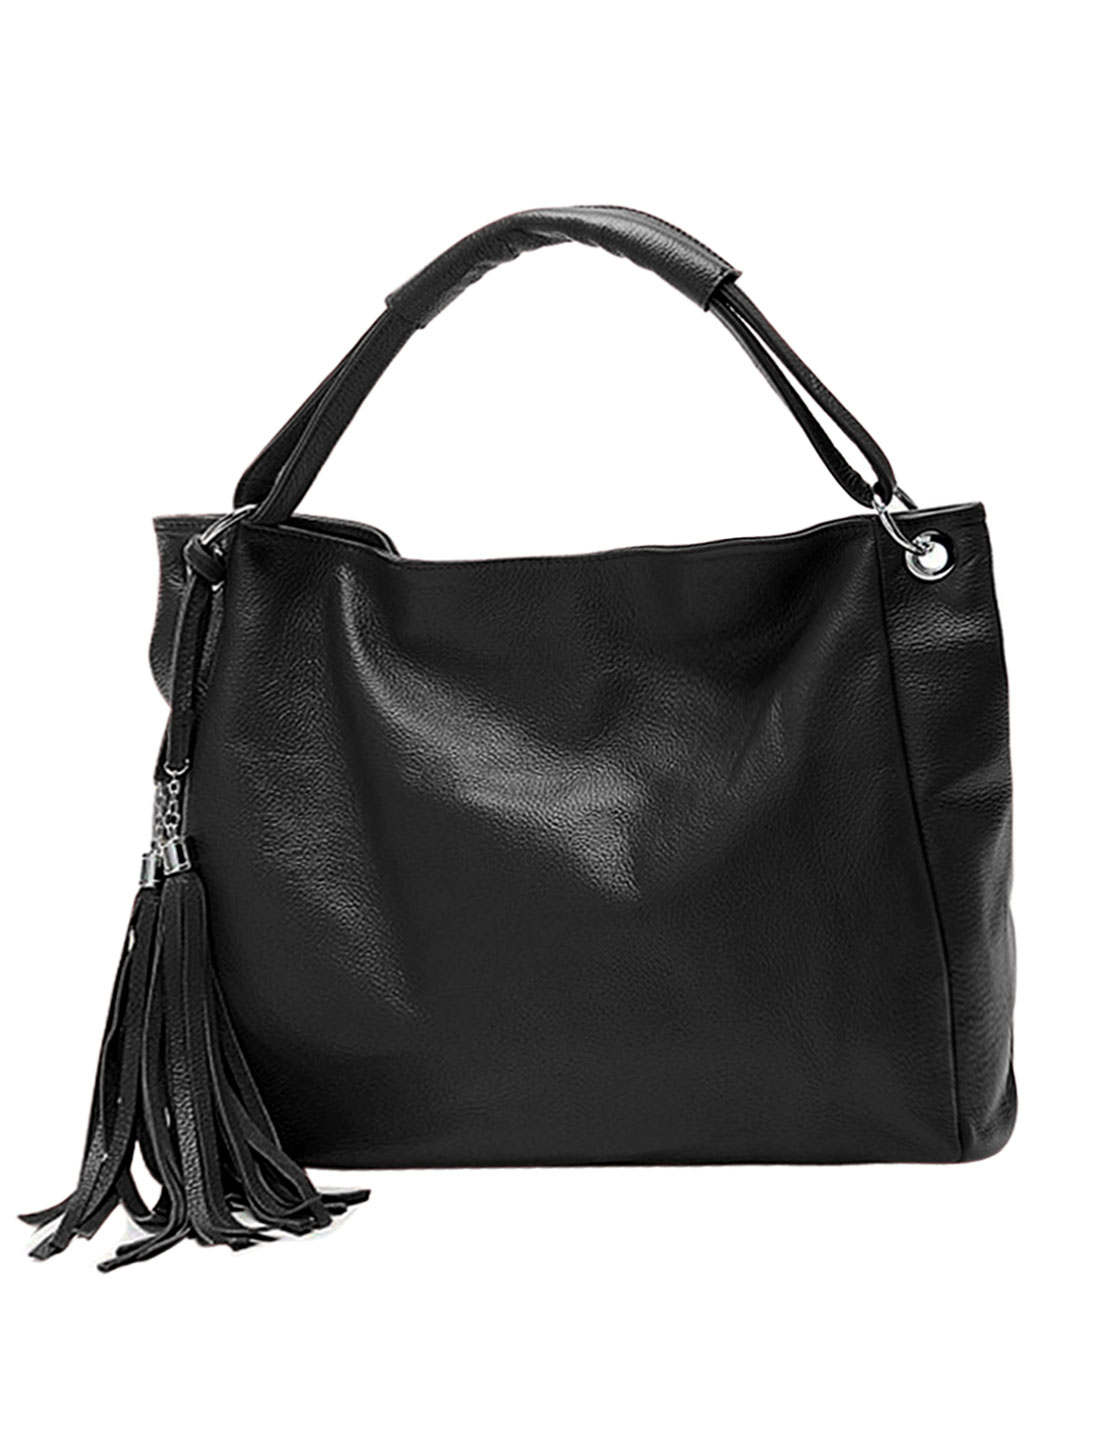 Ladies Tassels Decor Zip Closed PU Leather Slouch Hobo Bag Black